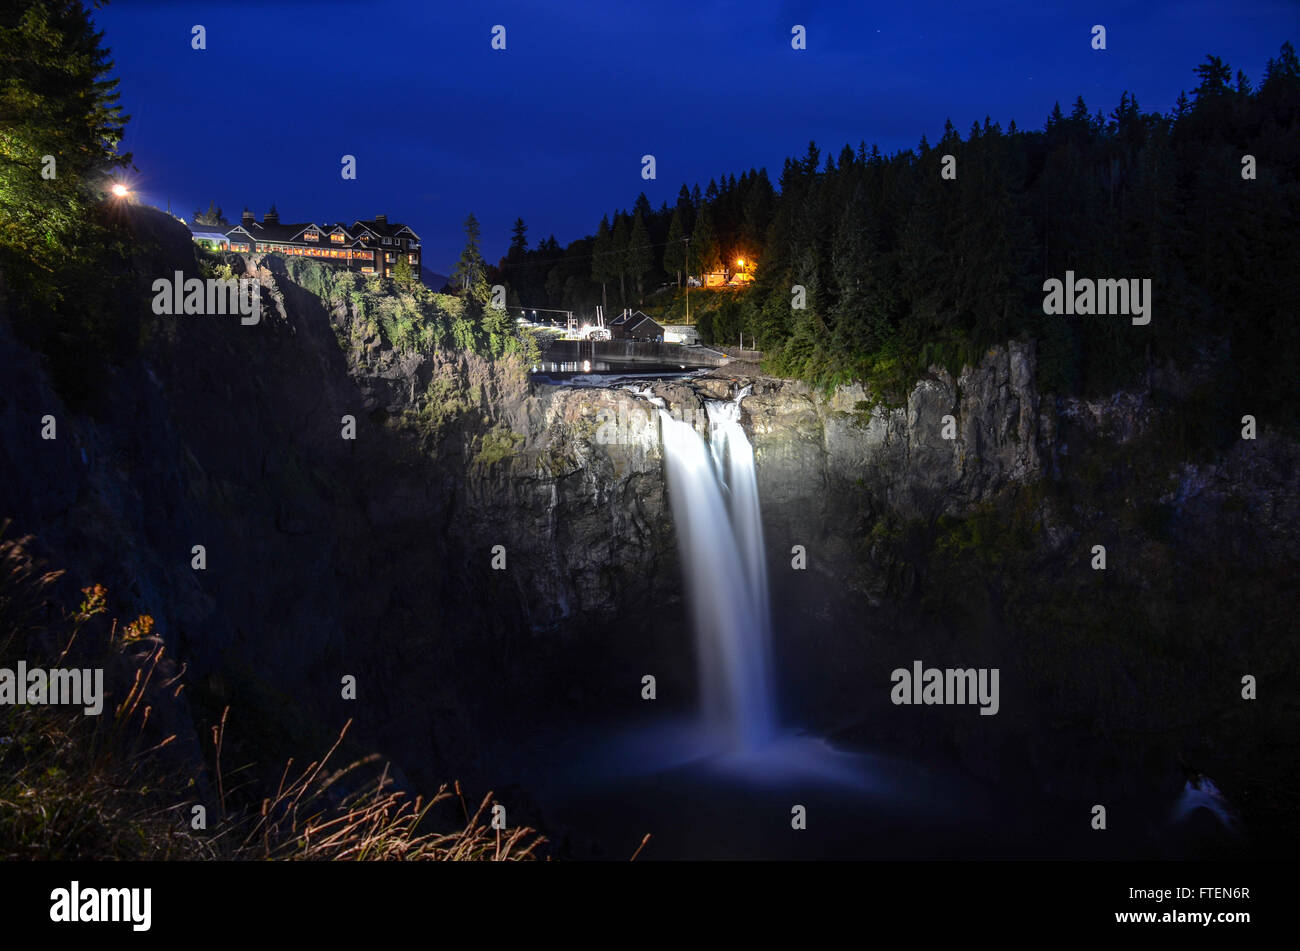 Snoqualmie Falls in Washington - Stock Image